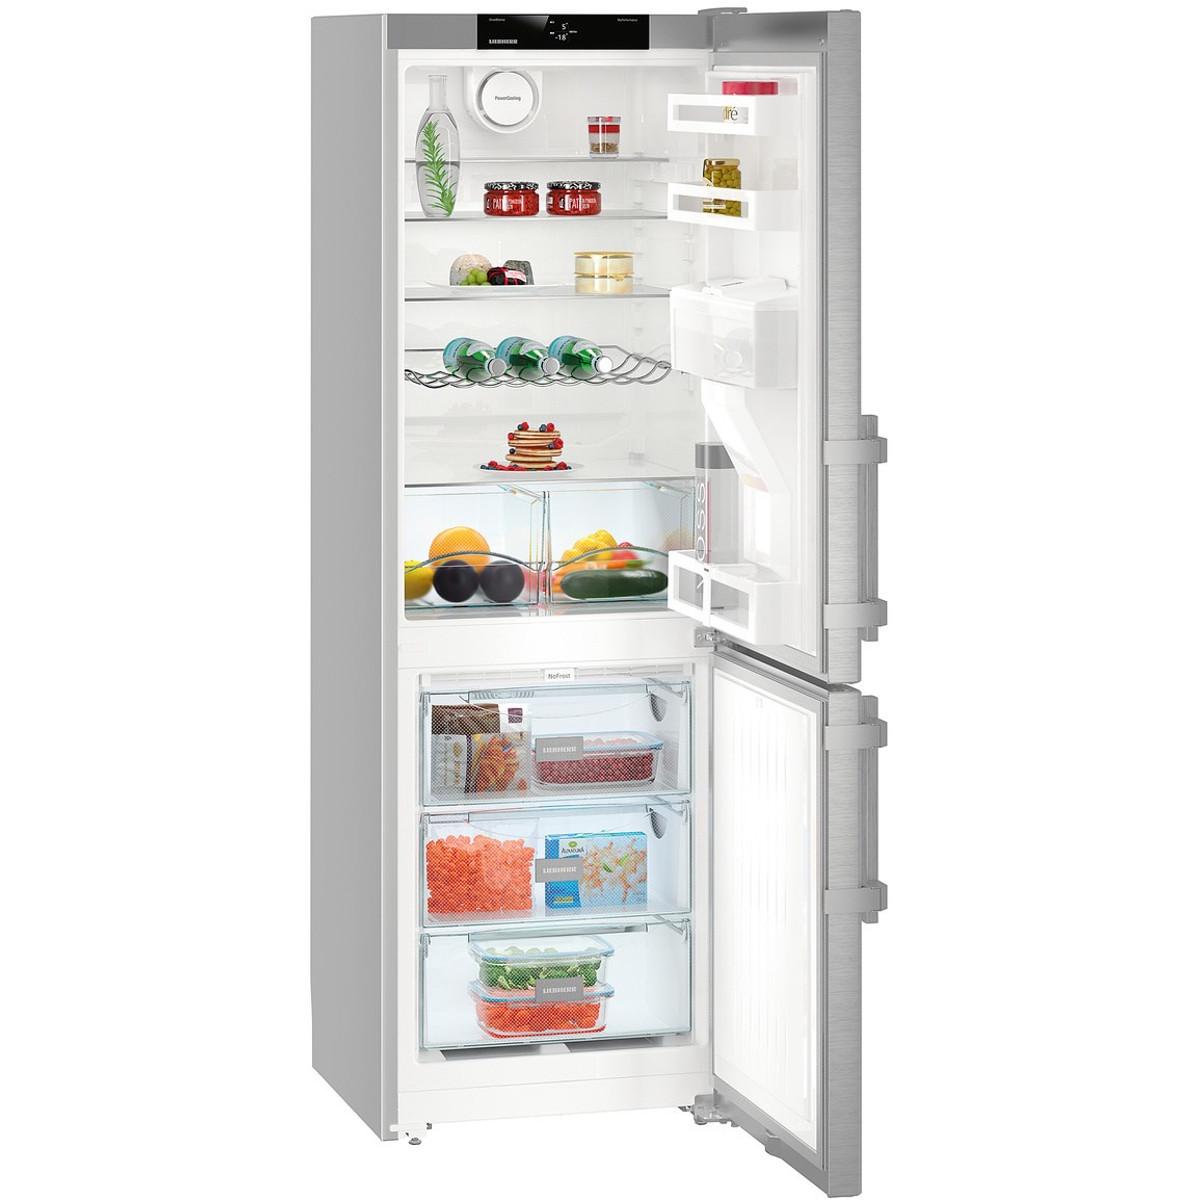 liebherr cnef 3535 comfort nofrost fridge freezer. Black Bedroom Furniture Sets. Home Design Ideas